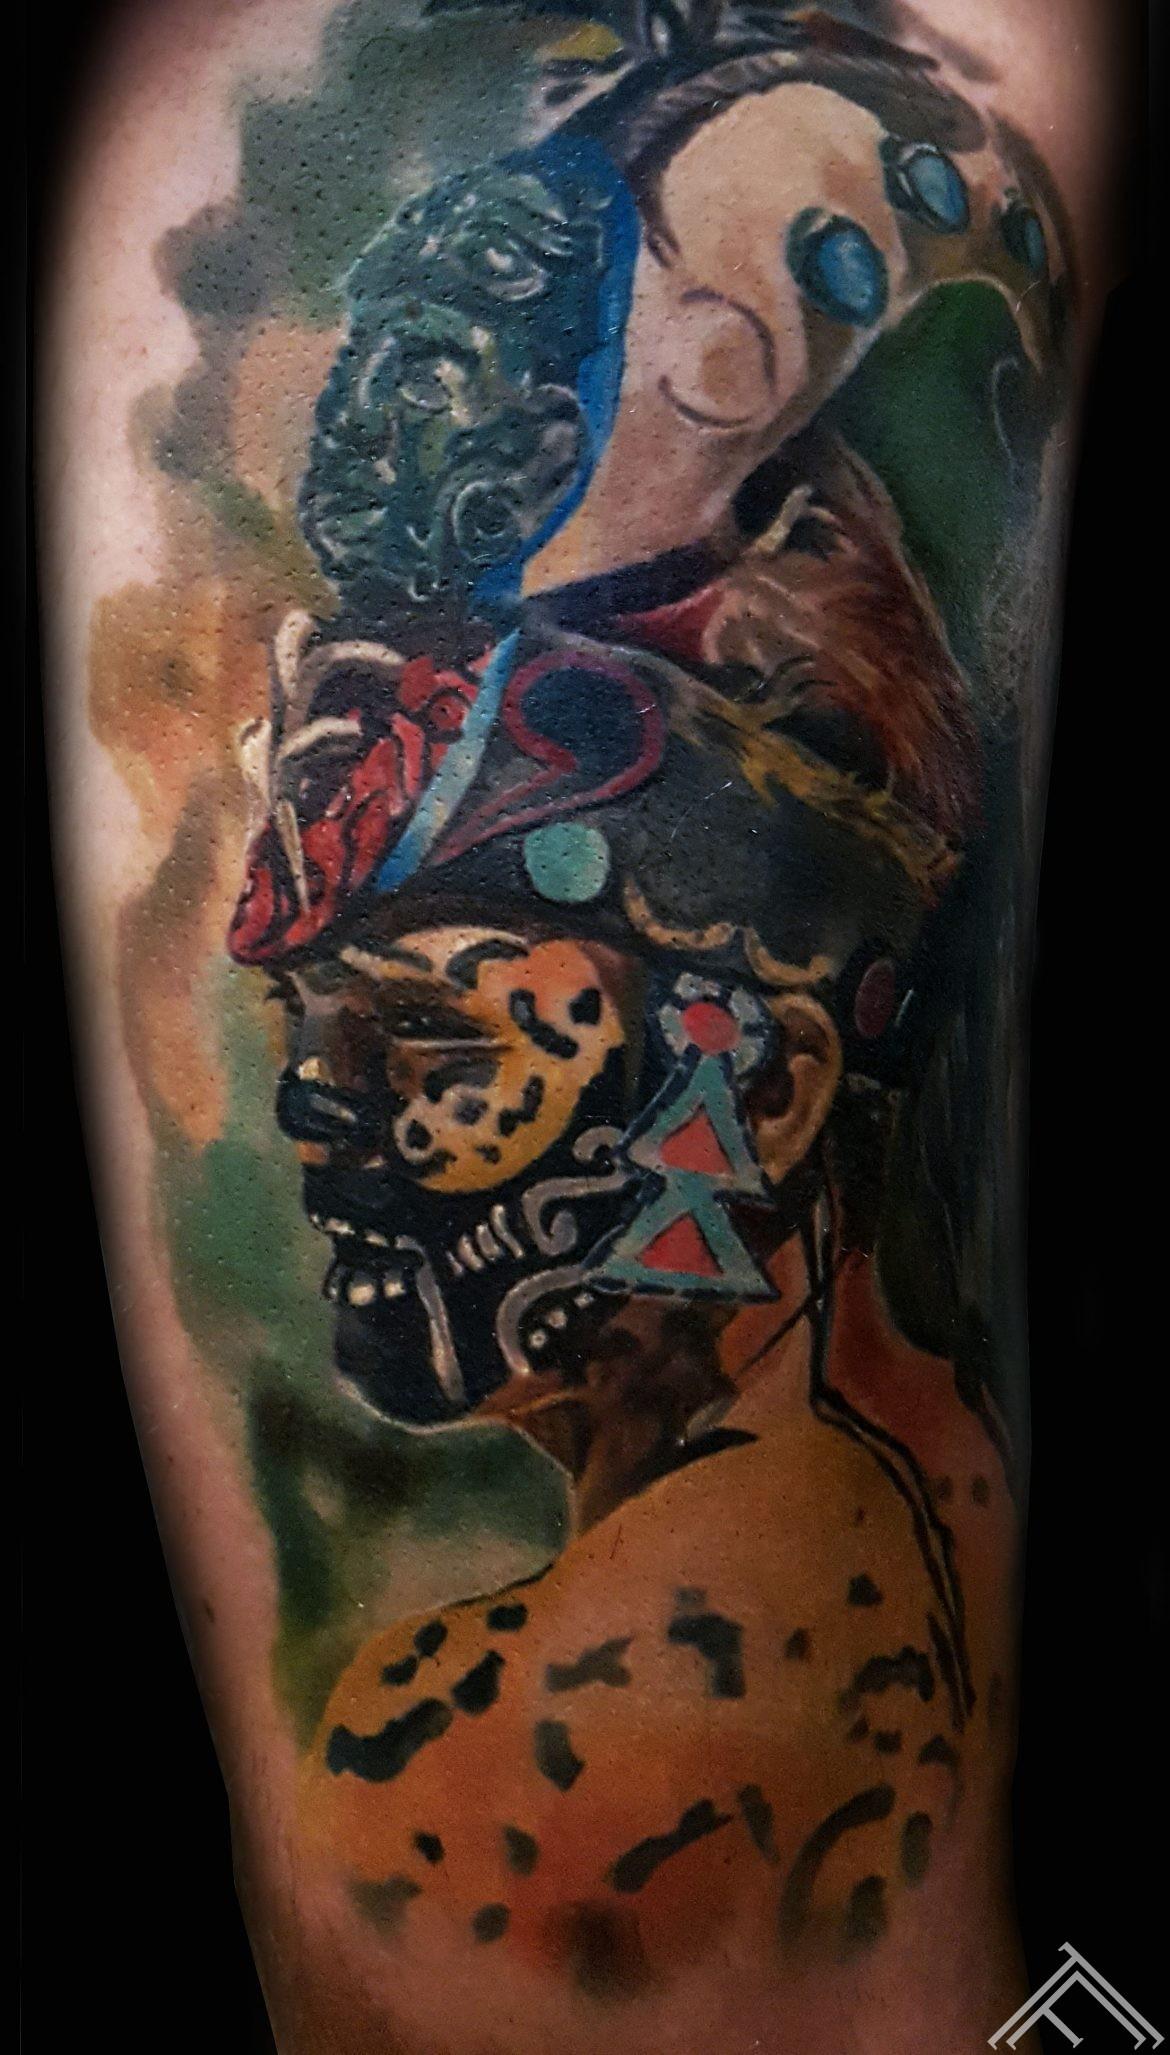 mexico_tribal_leader_chieftain_maya_native_people_healed_black